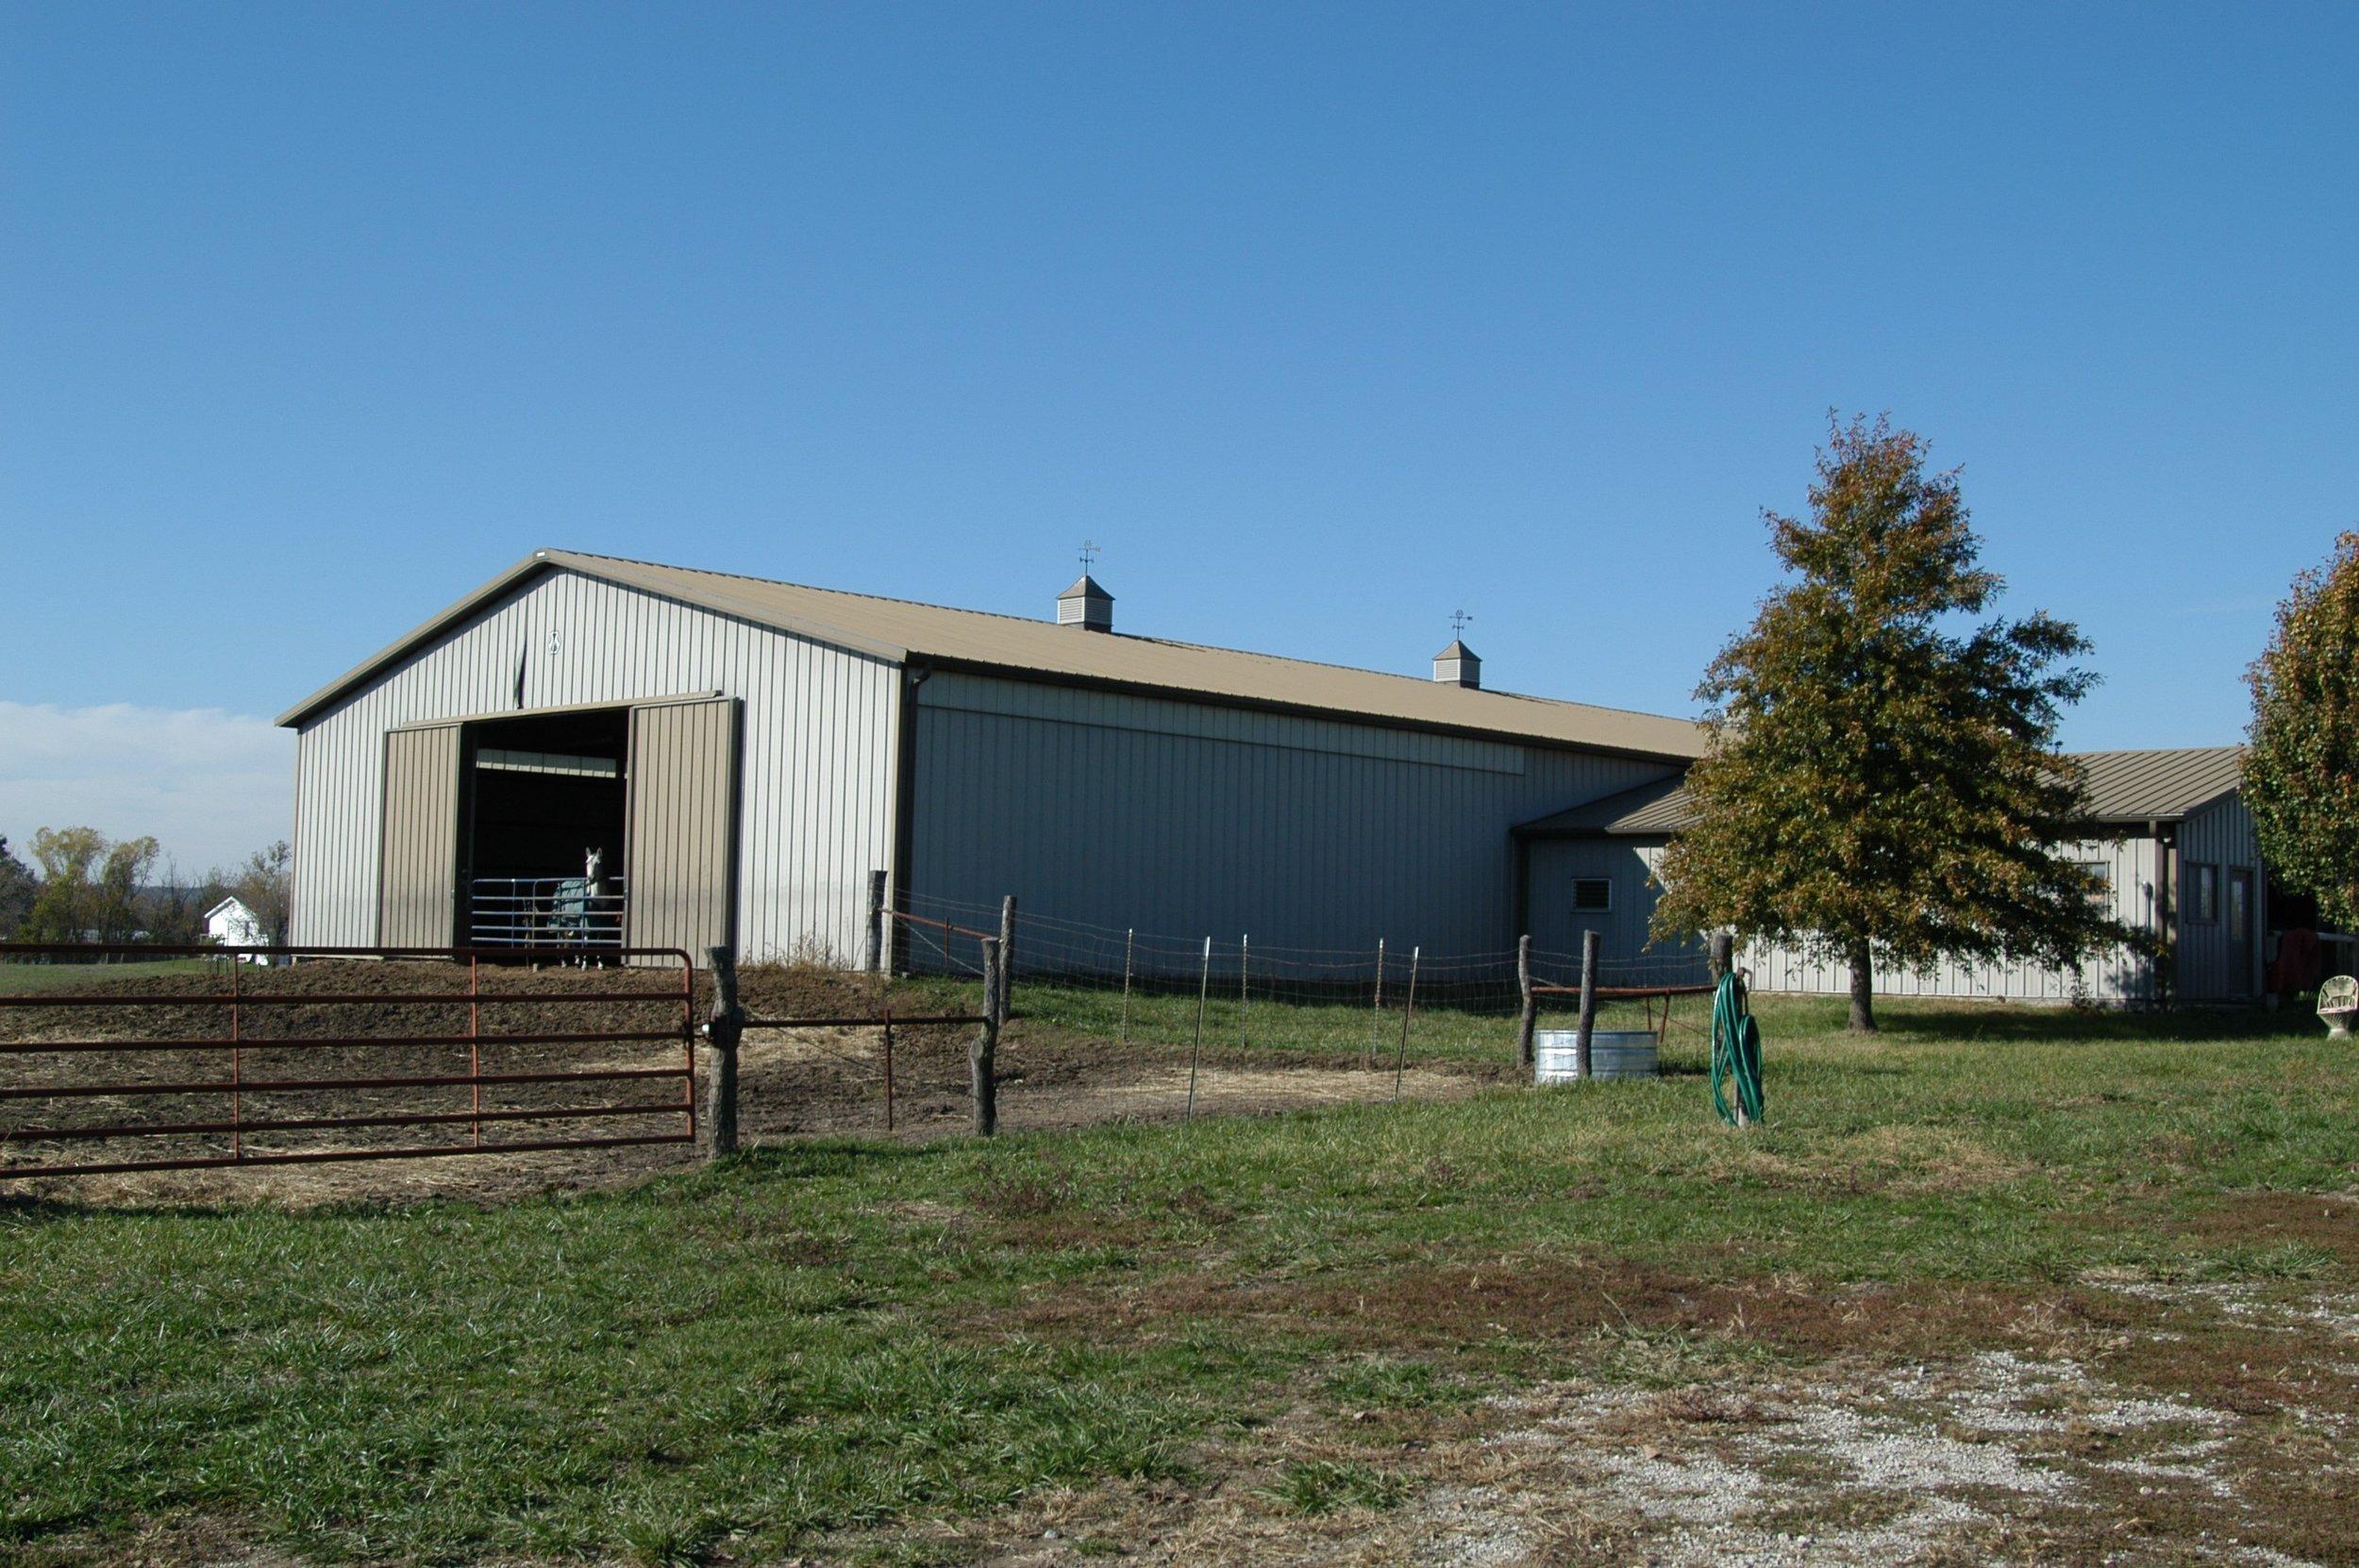 Our big barn